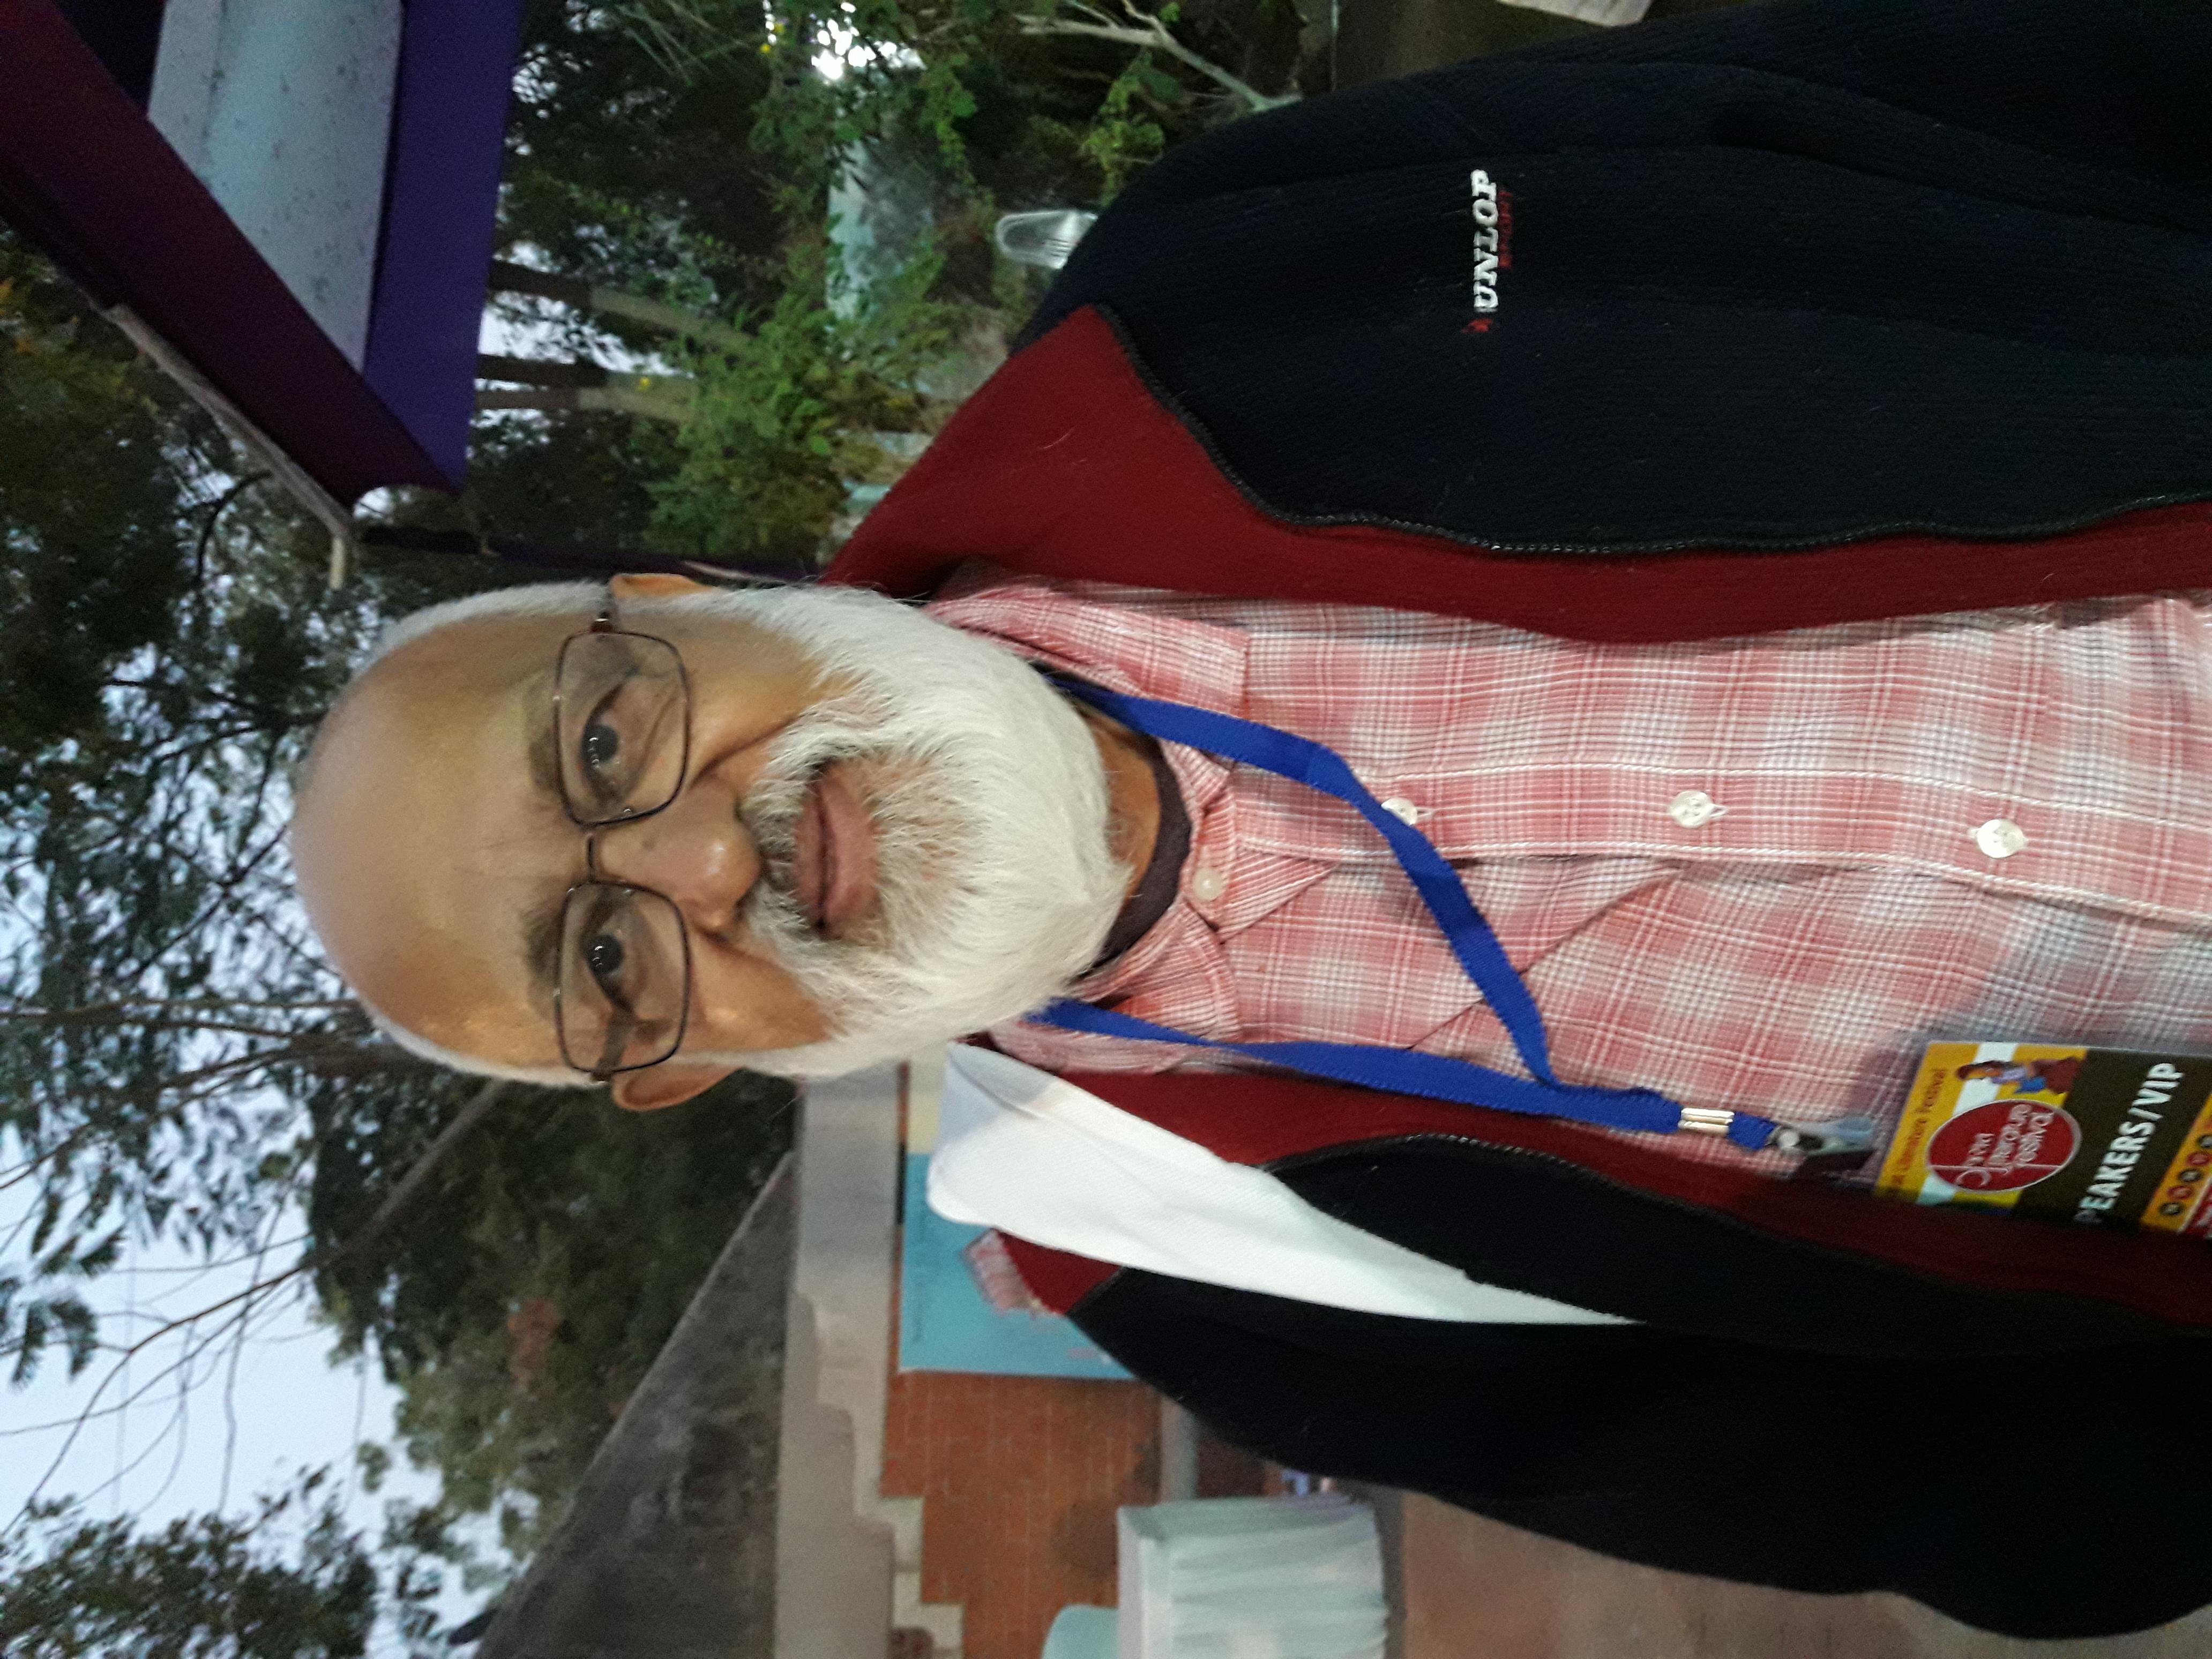 at Gujarati Literature Festival, [[Ahmedabad]] on 16 December 2016